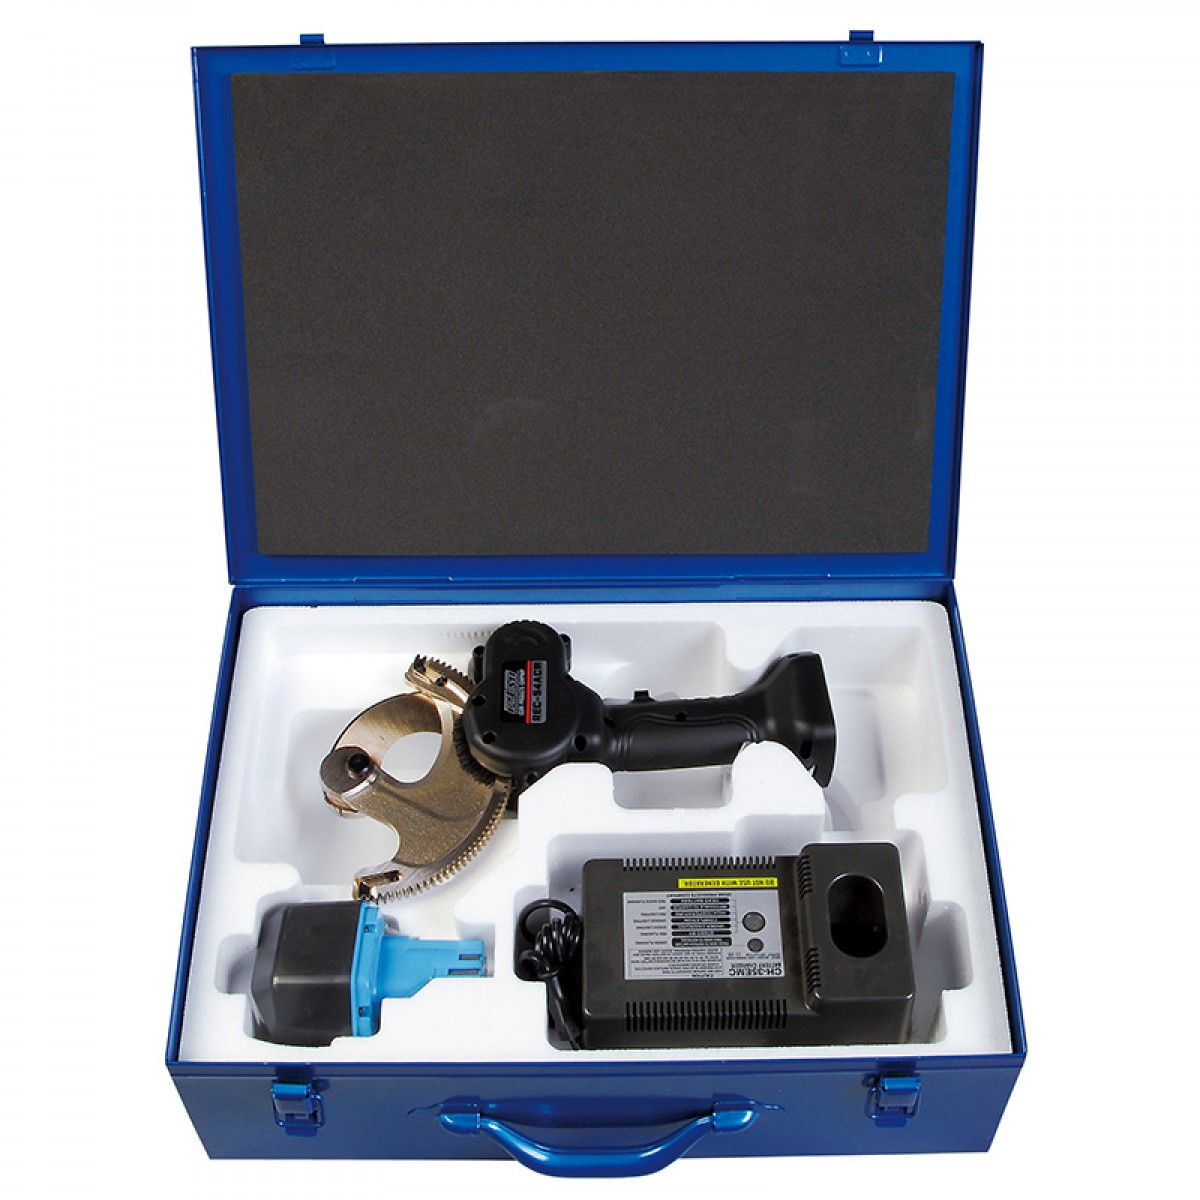 izumi  REC-54ACM 泉精器 充电式切刀